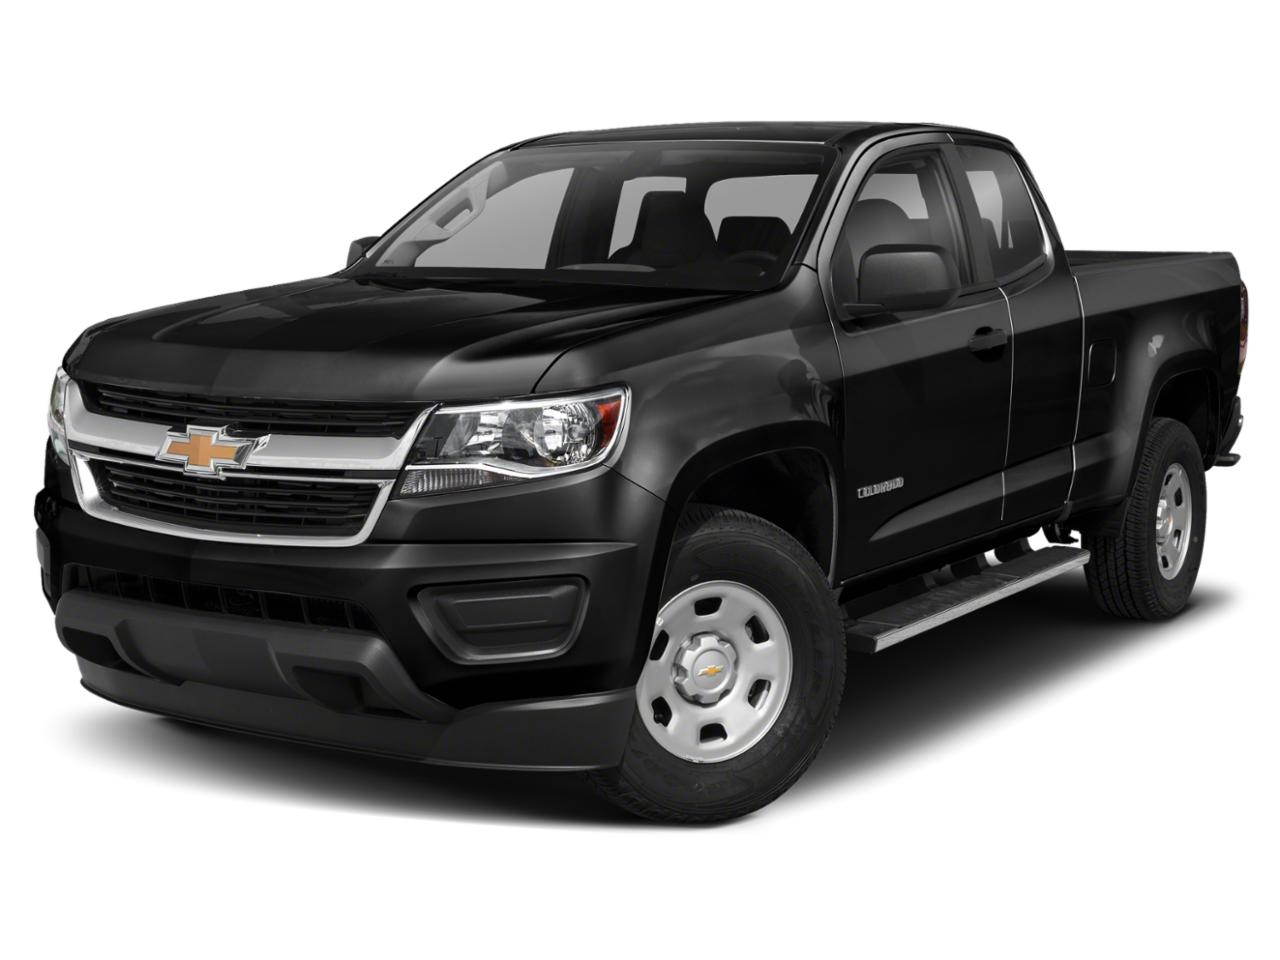 2020 Chevrolet Colorado Vehicle Photo in TERRYVILLE, CT 06786-5904